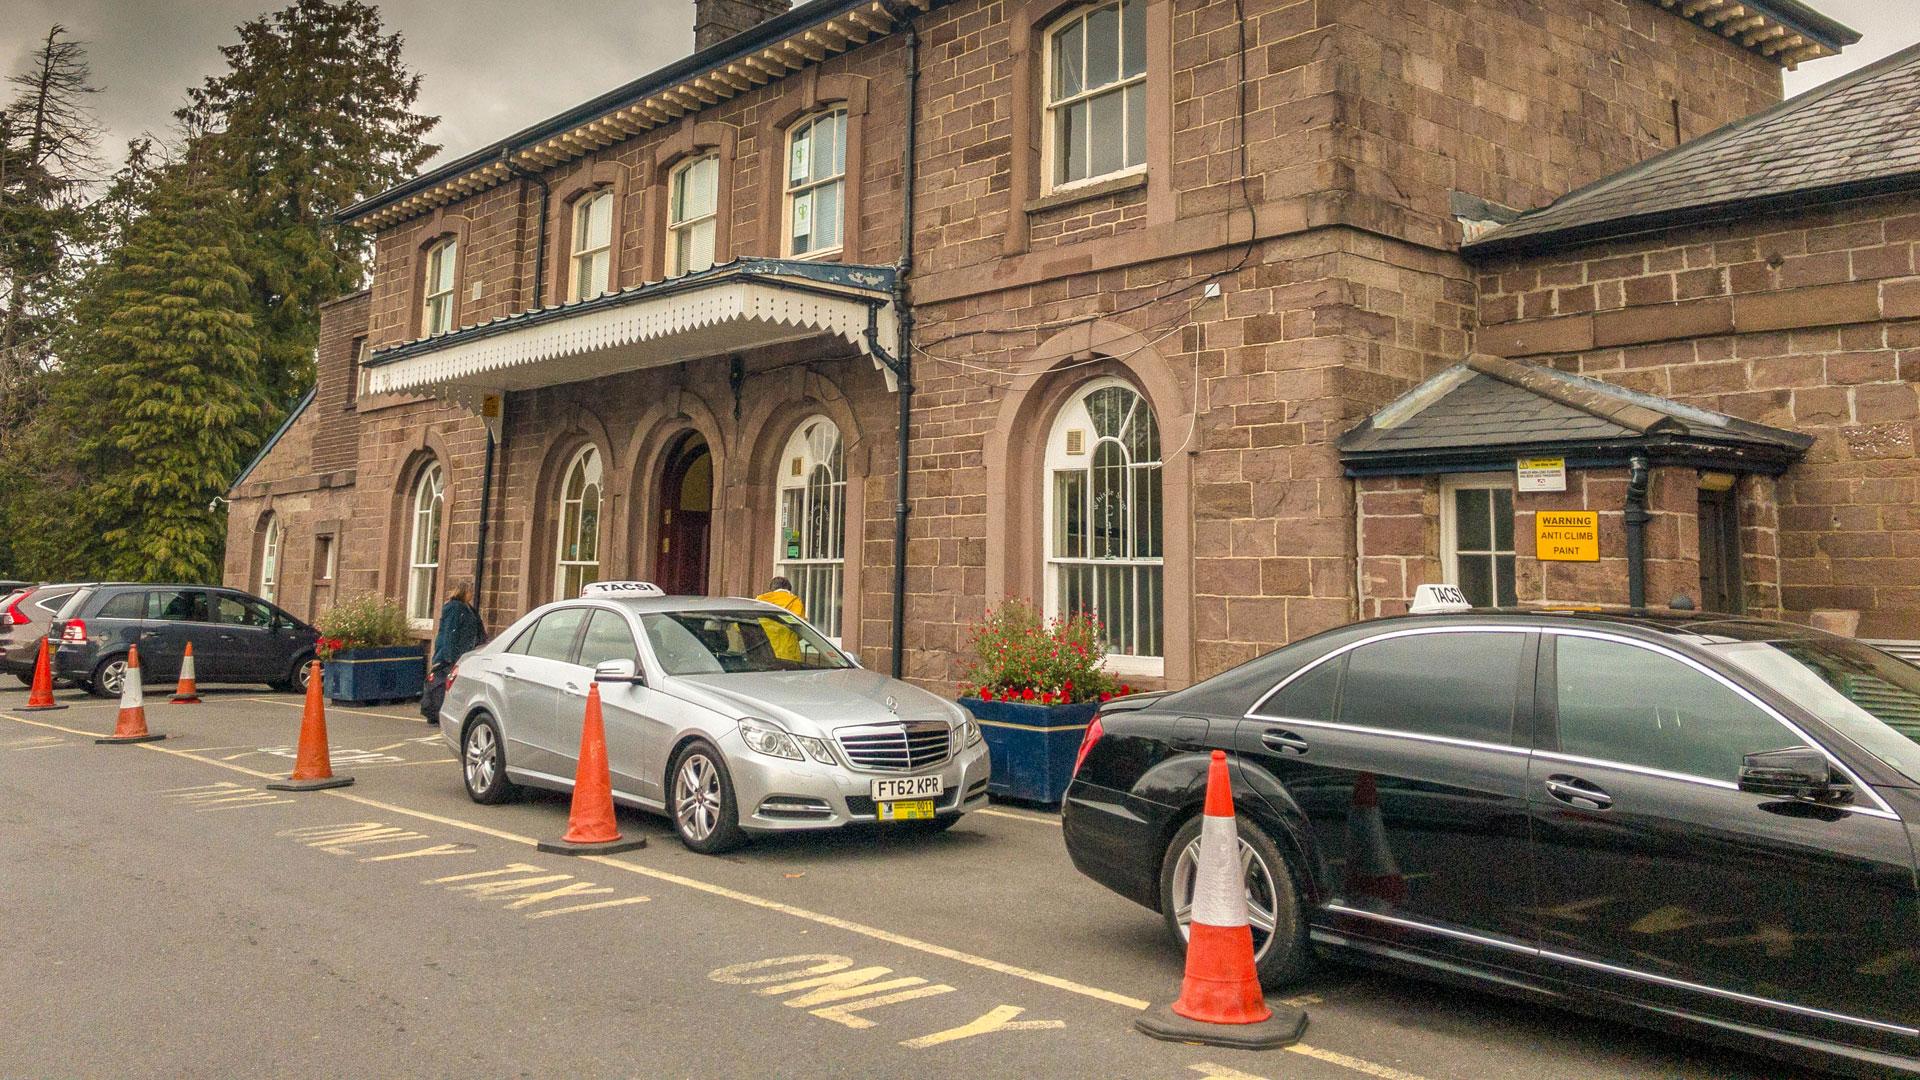 Taxi cabs Abergavenny